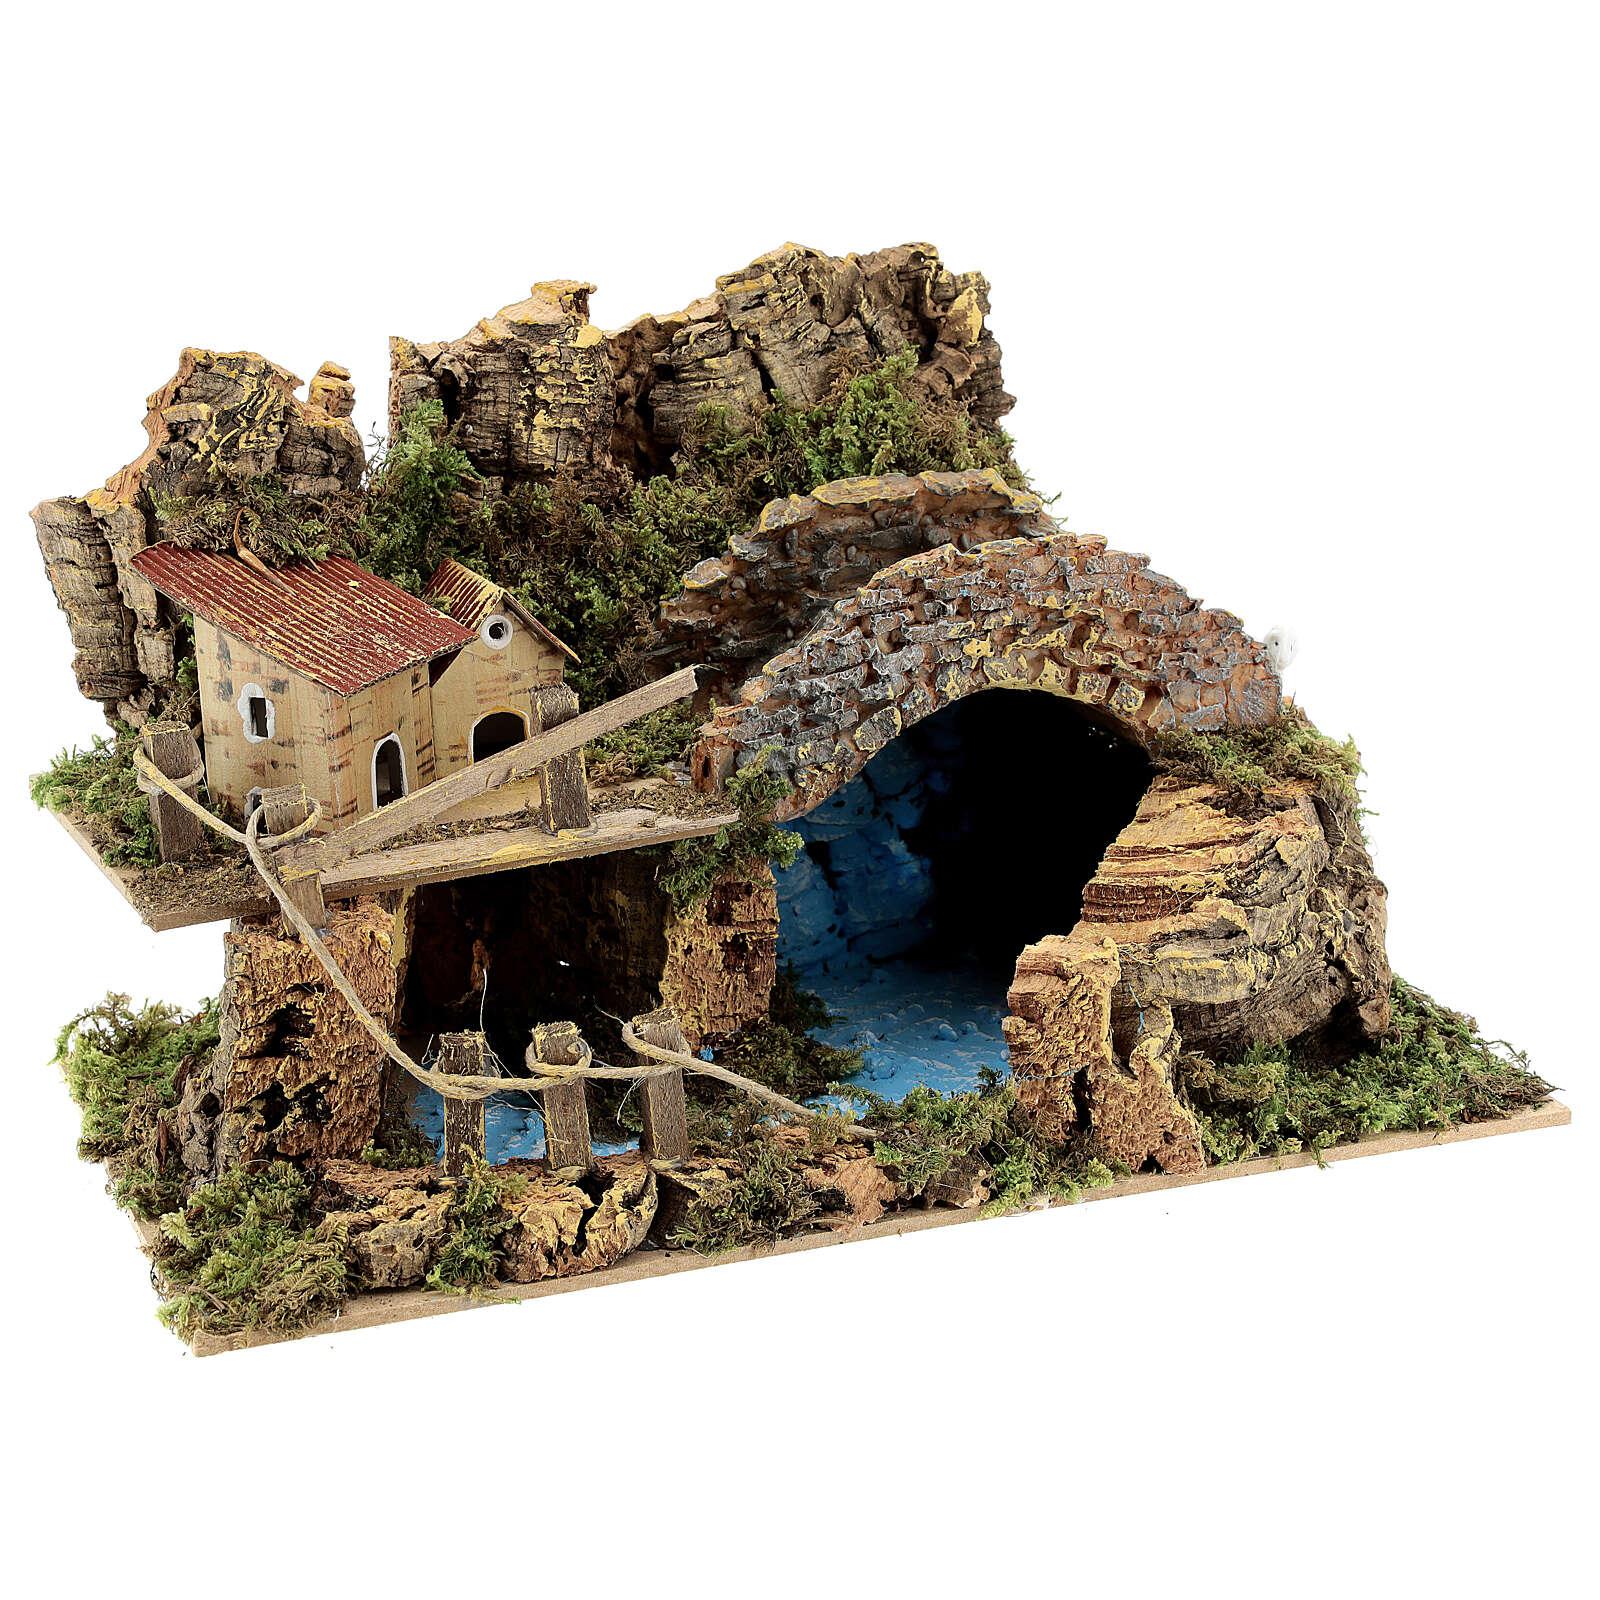 Puente y lago cm 20x30x15 belenes 6 cm 4